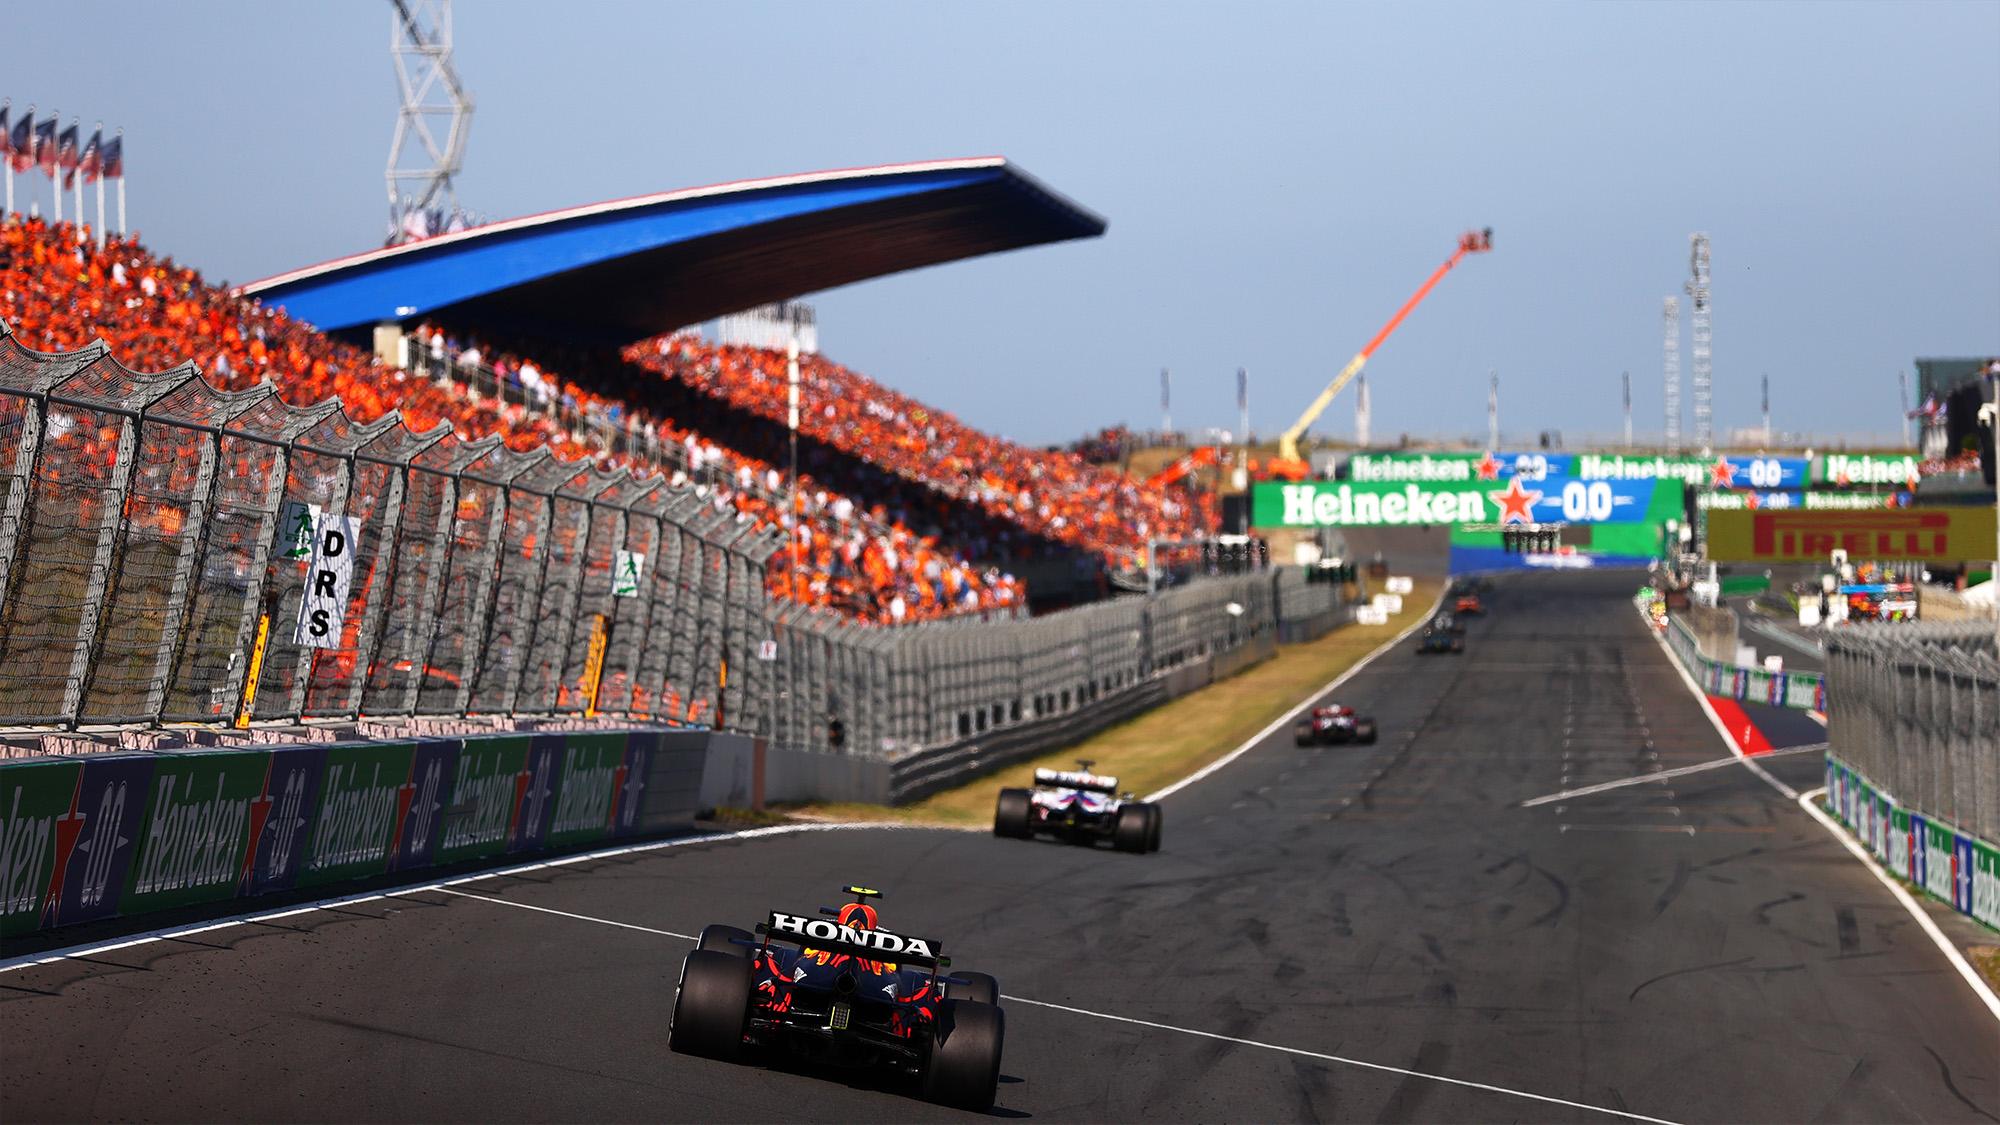 A line of cars ahead of Sergio Perez in the 2021 Dutch Grand Prix